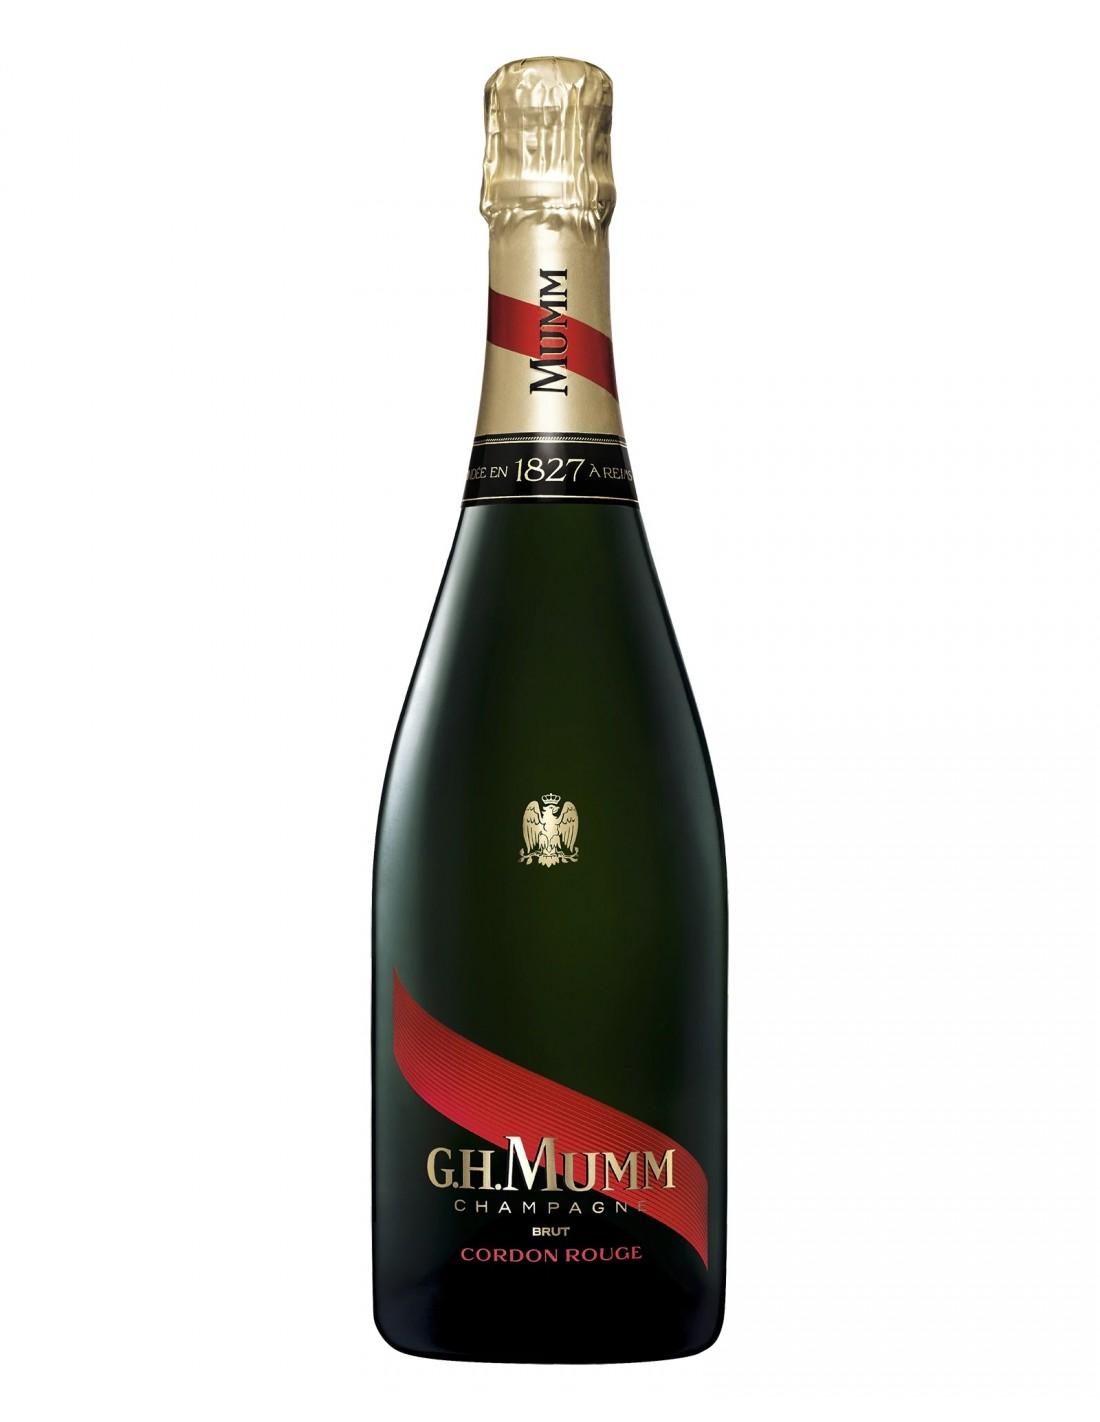 Sampanie, G.H Mumm Cordon Rouge Champagne, 0.75L, 12% alc., Franta